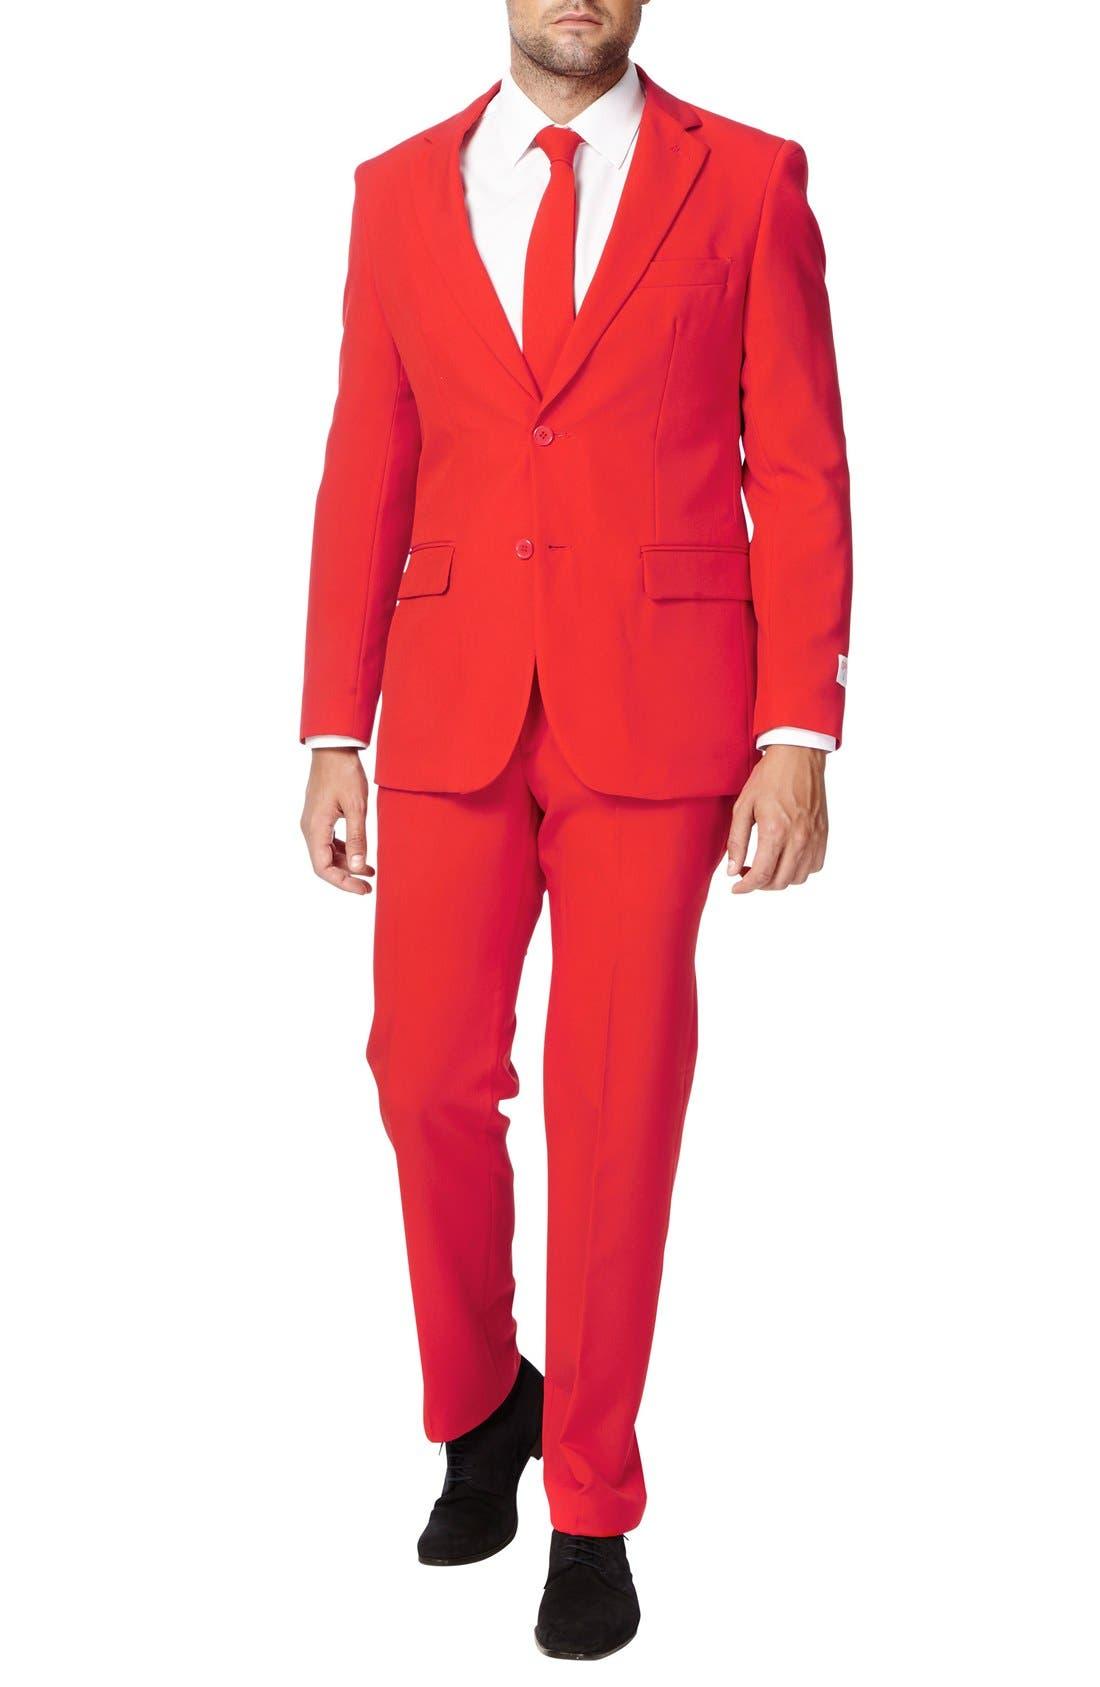 OppoSuit 'Red Devil' Trim Fit Two-Piece Suit with Tie,                             Alternate thumbnail 4, color,                             610